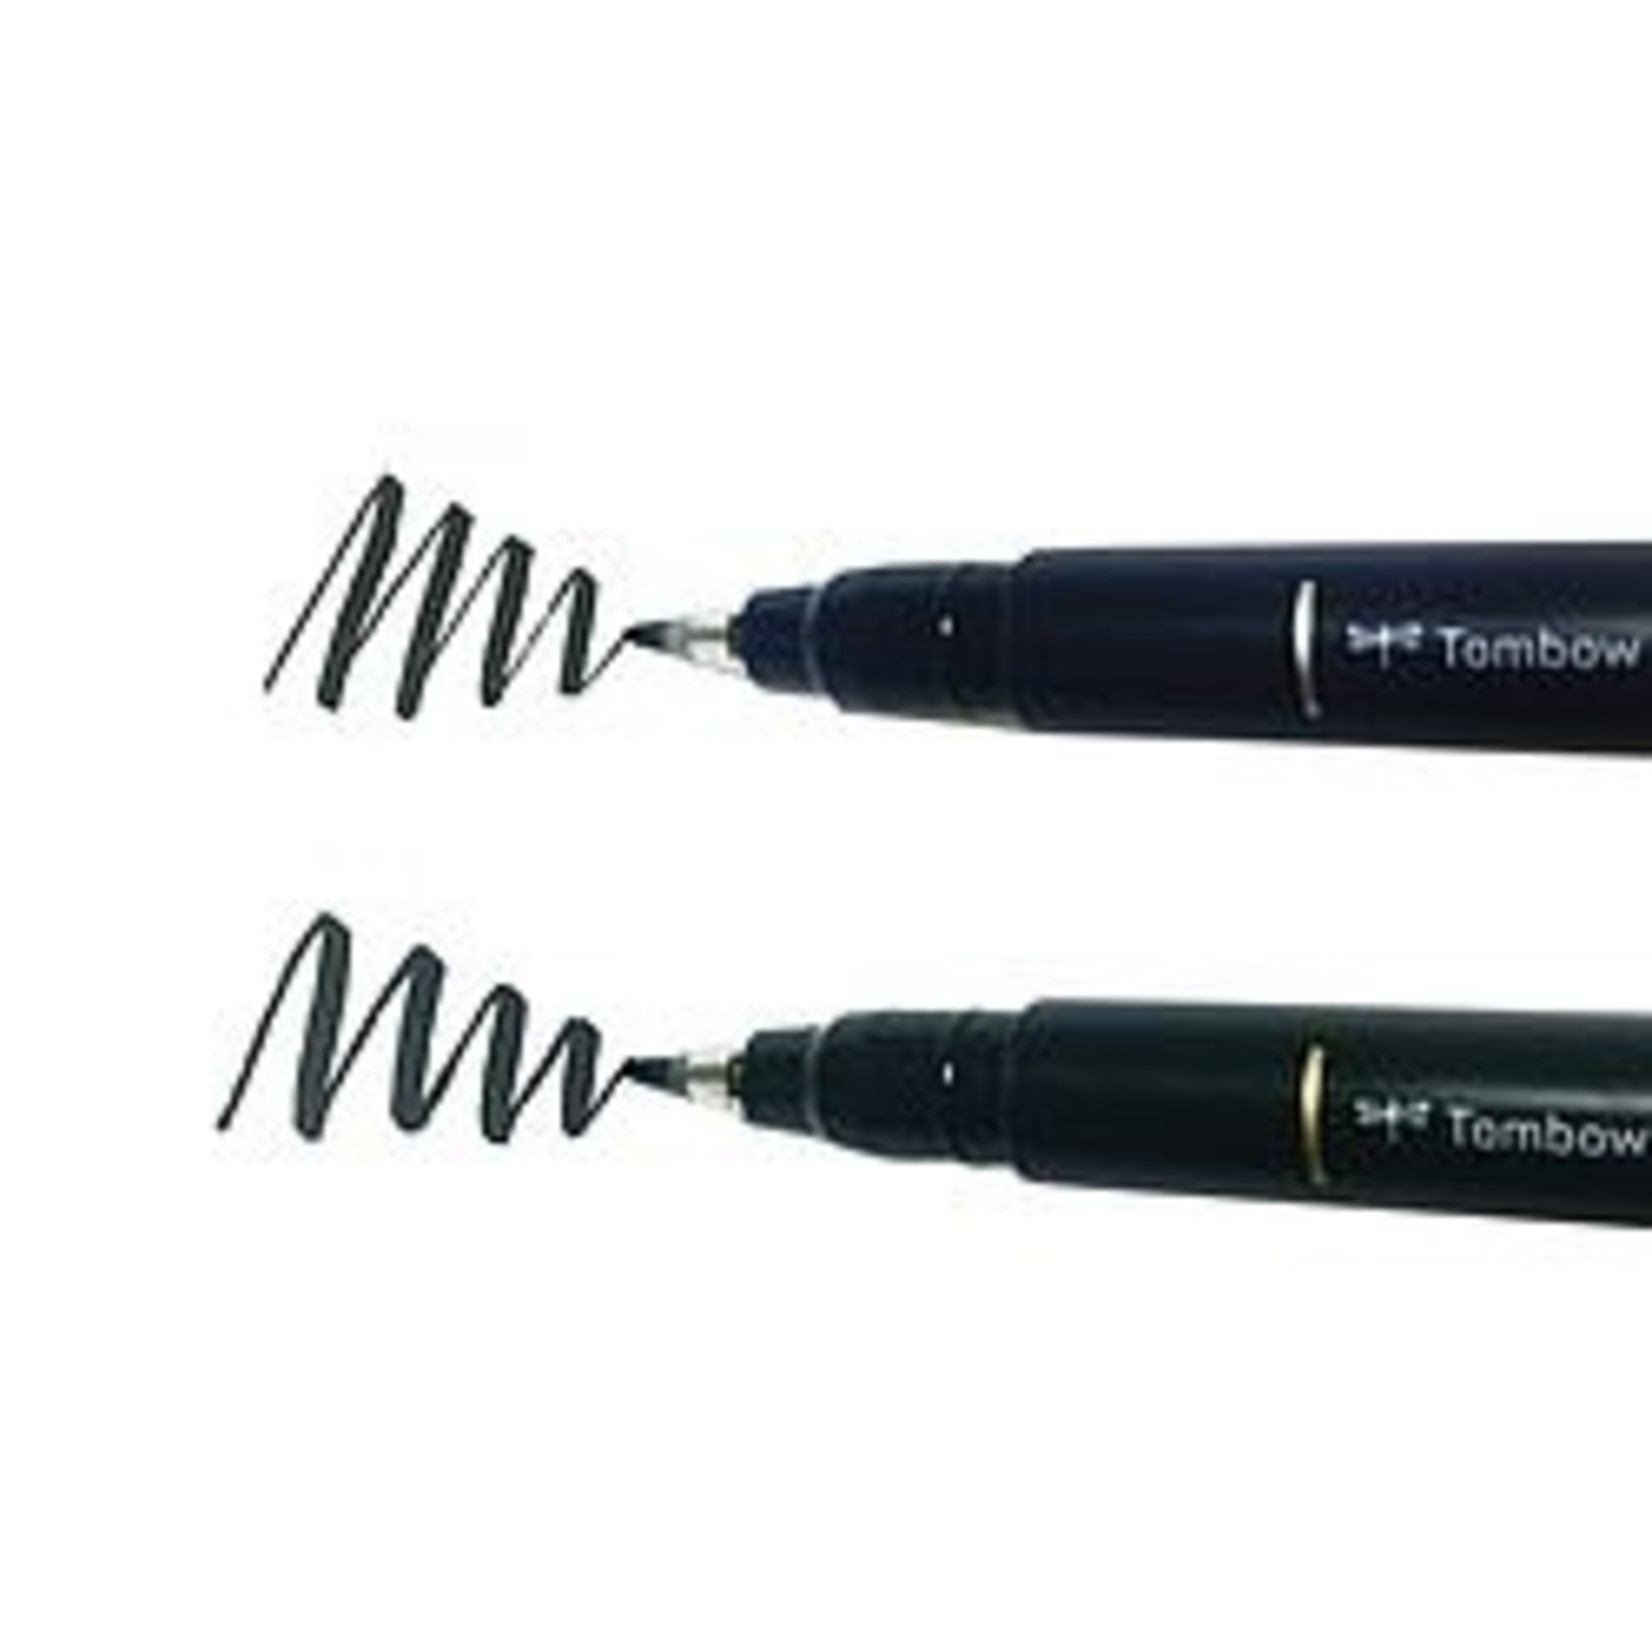 Tombow Fudenosuke Pen, weiche Spitze, schwarz